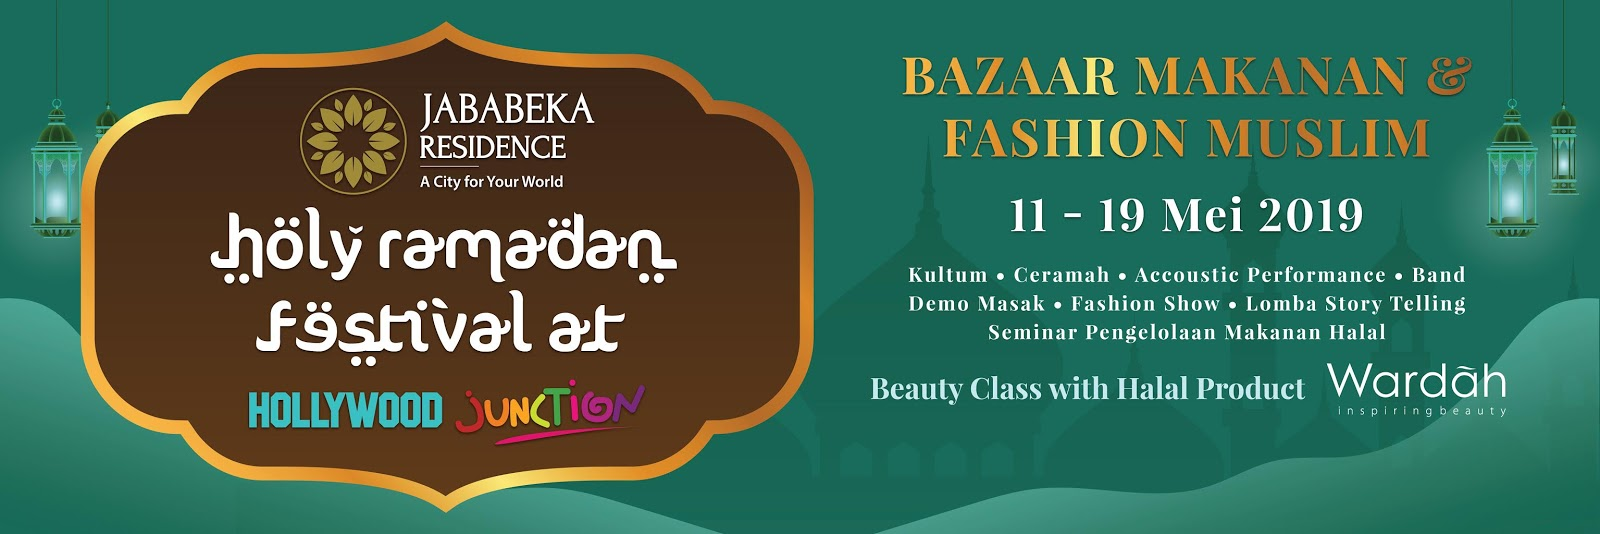 Spanduk Lomba Fashion Show muslim